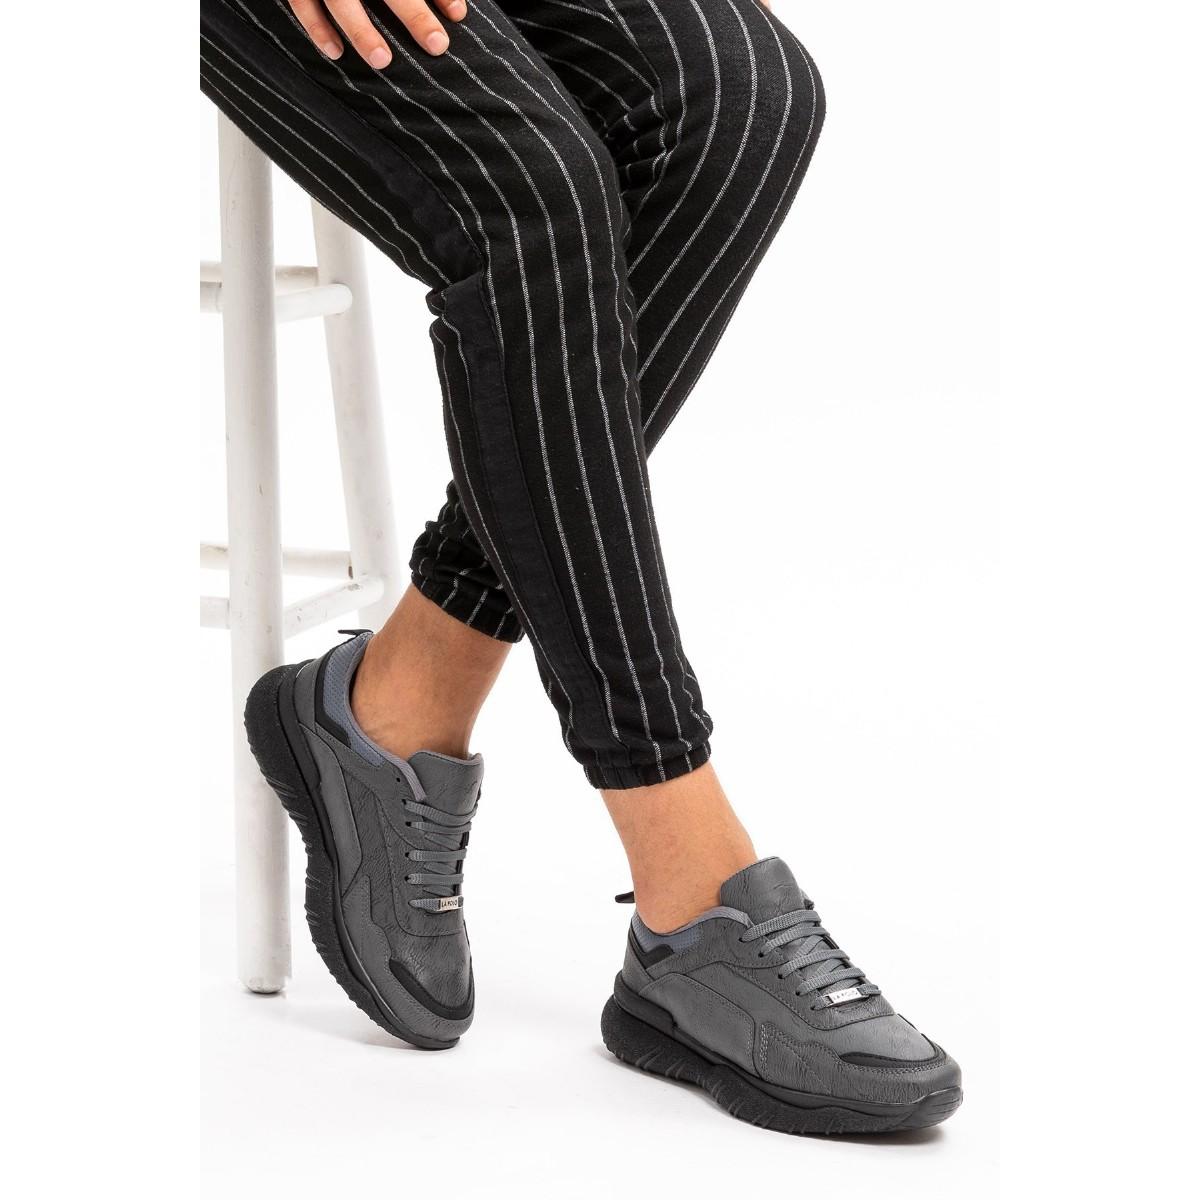 L.A. Polo 106 Füme Siyah Erkek Spor Ayakkabı